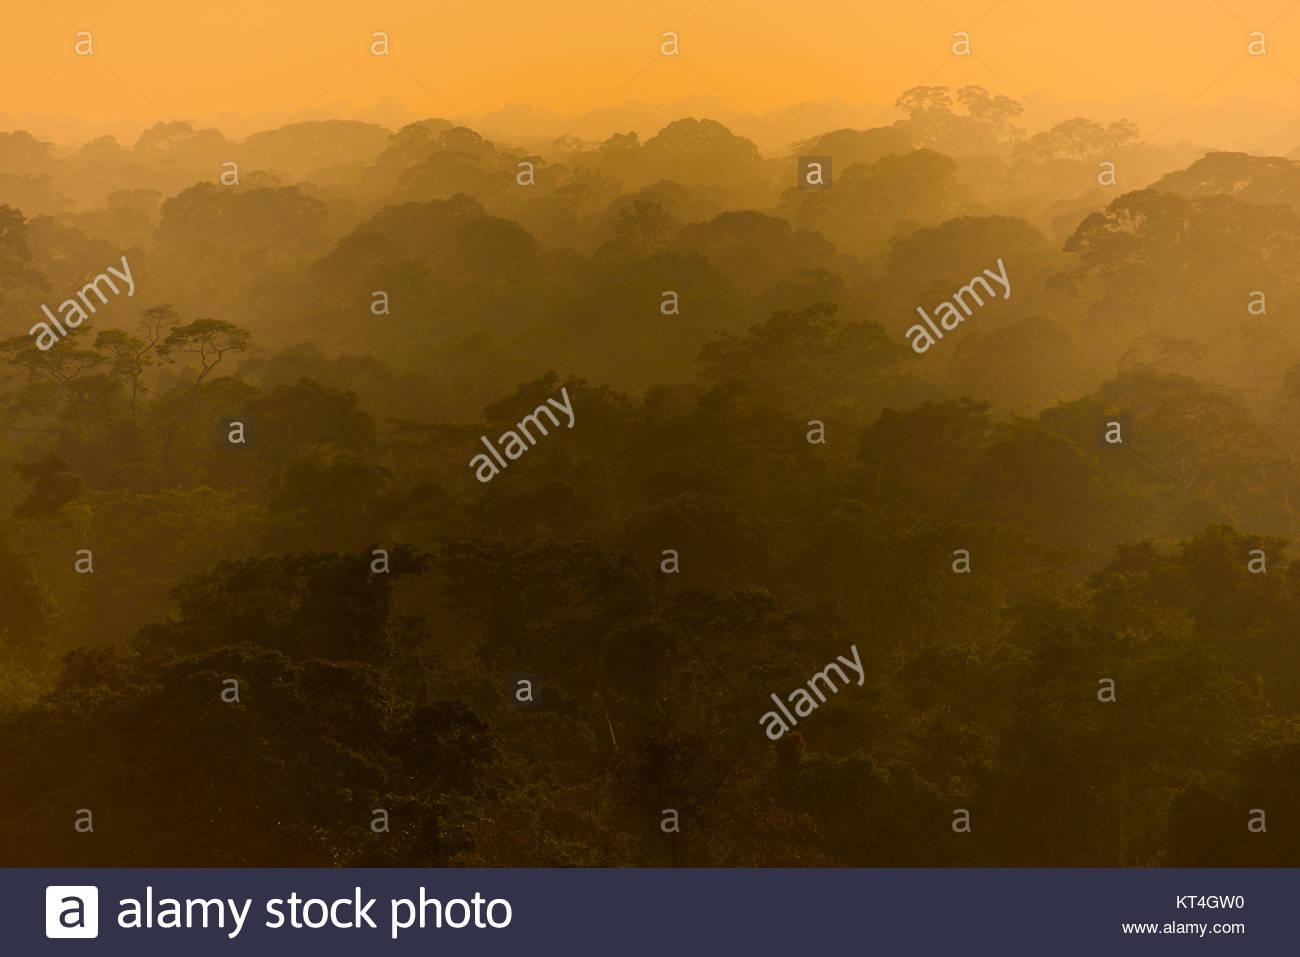 Amazon Rainforest Canopy Photo Stock